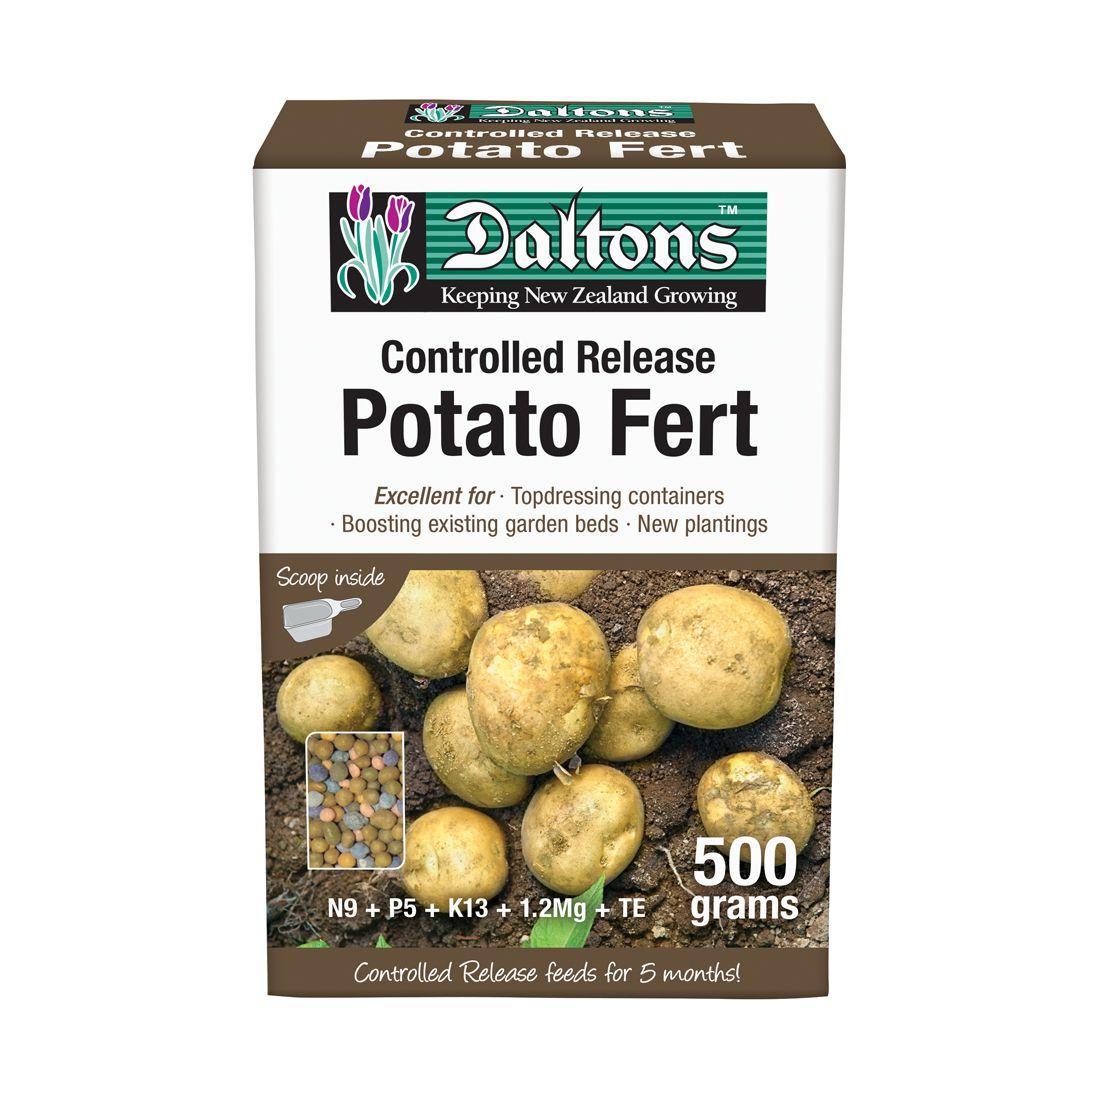 Potato Fertilizer Controlled Release 500g Box